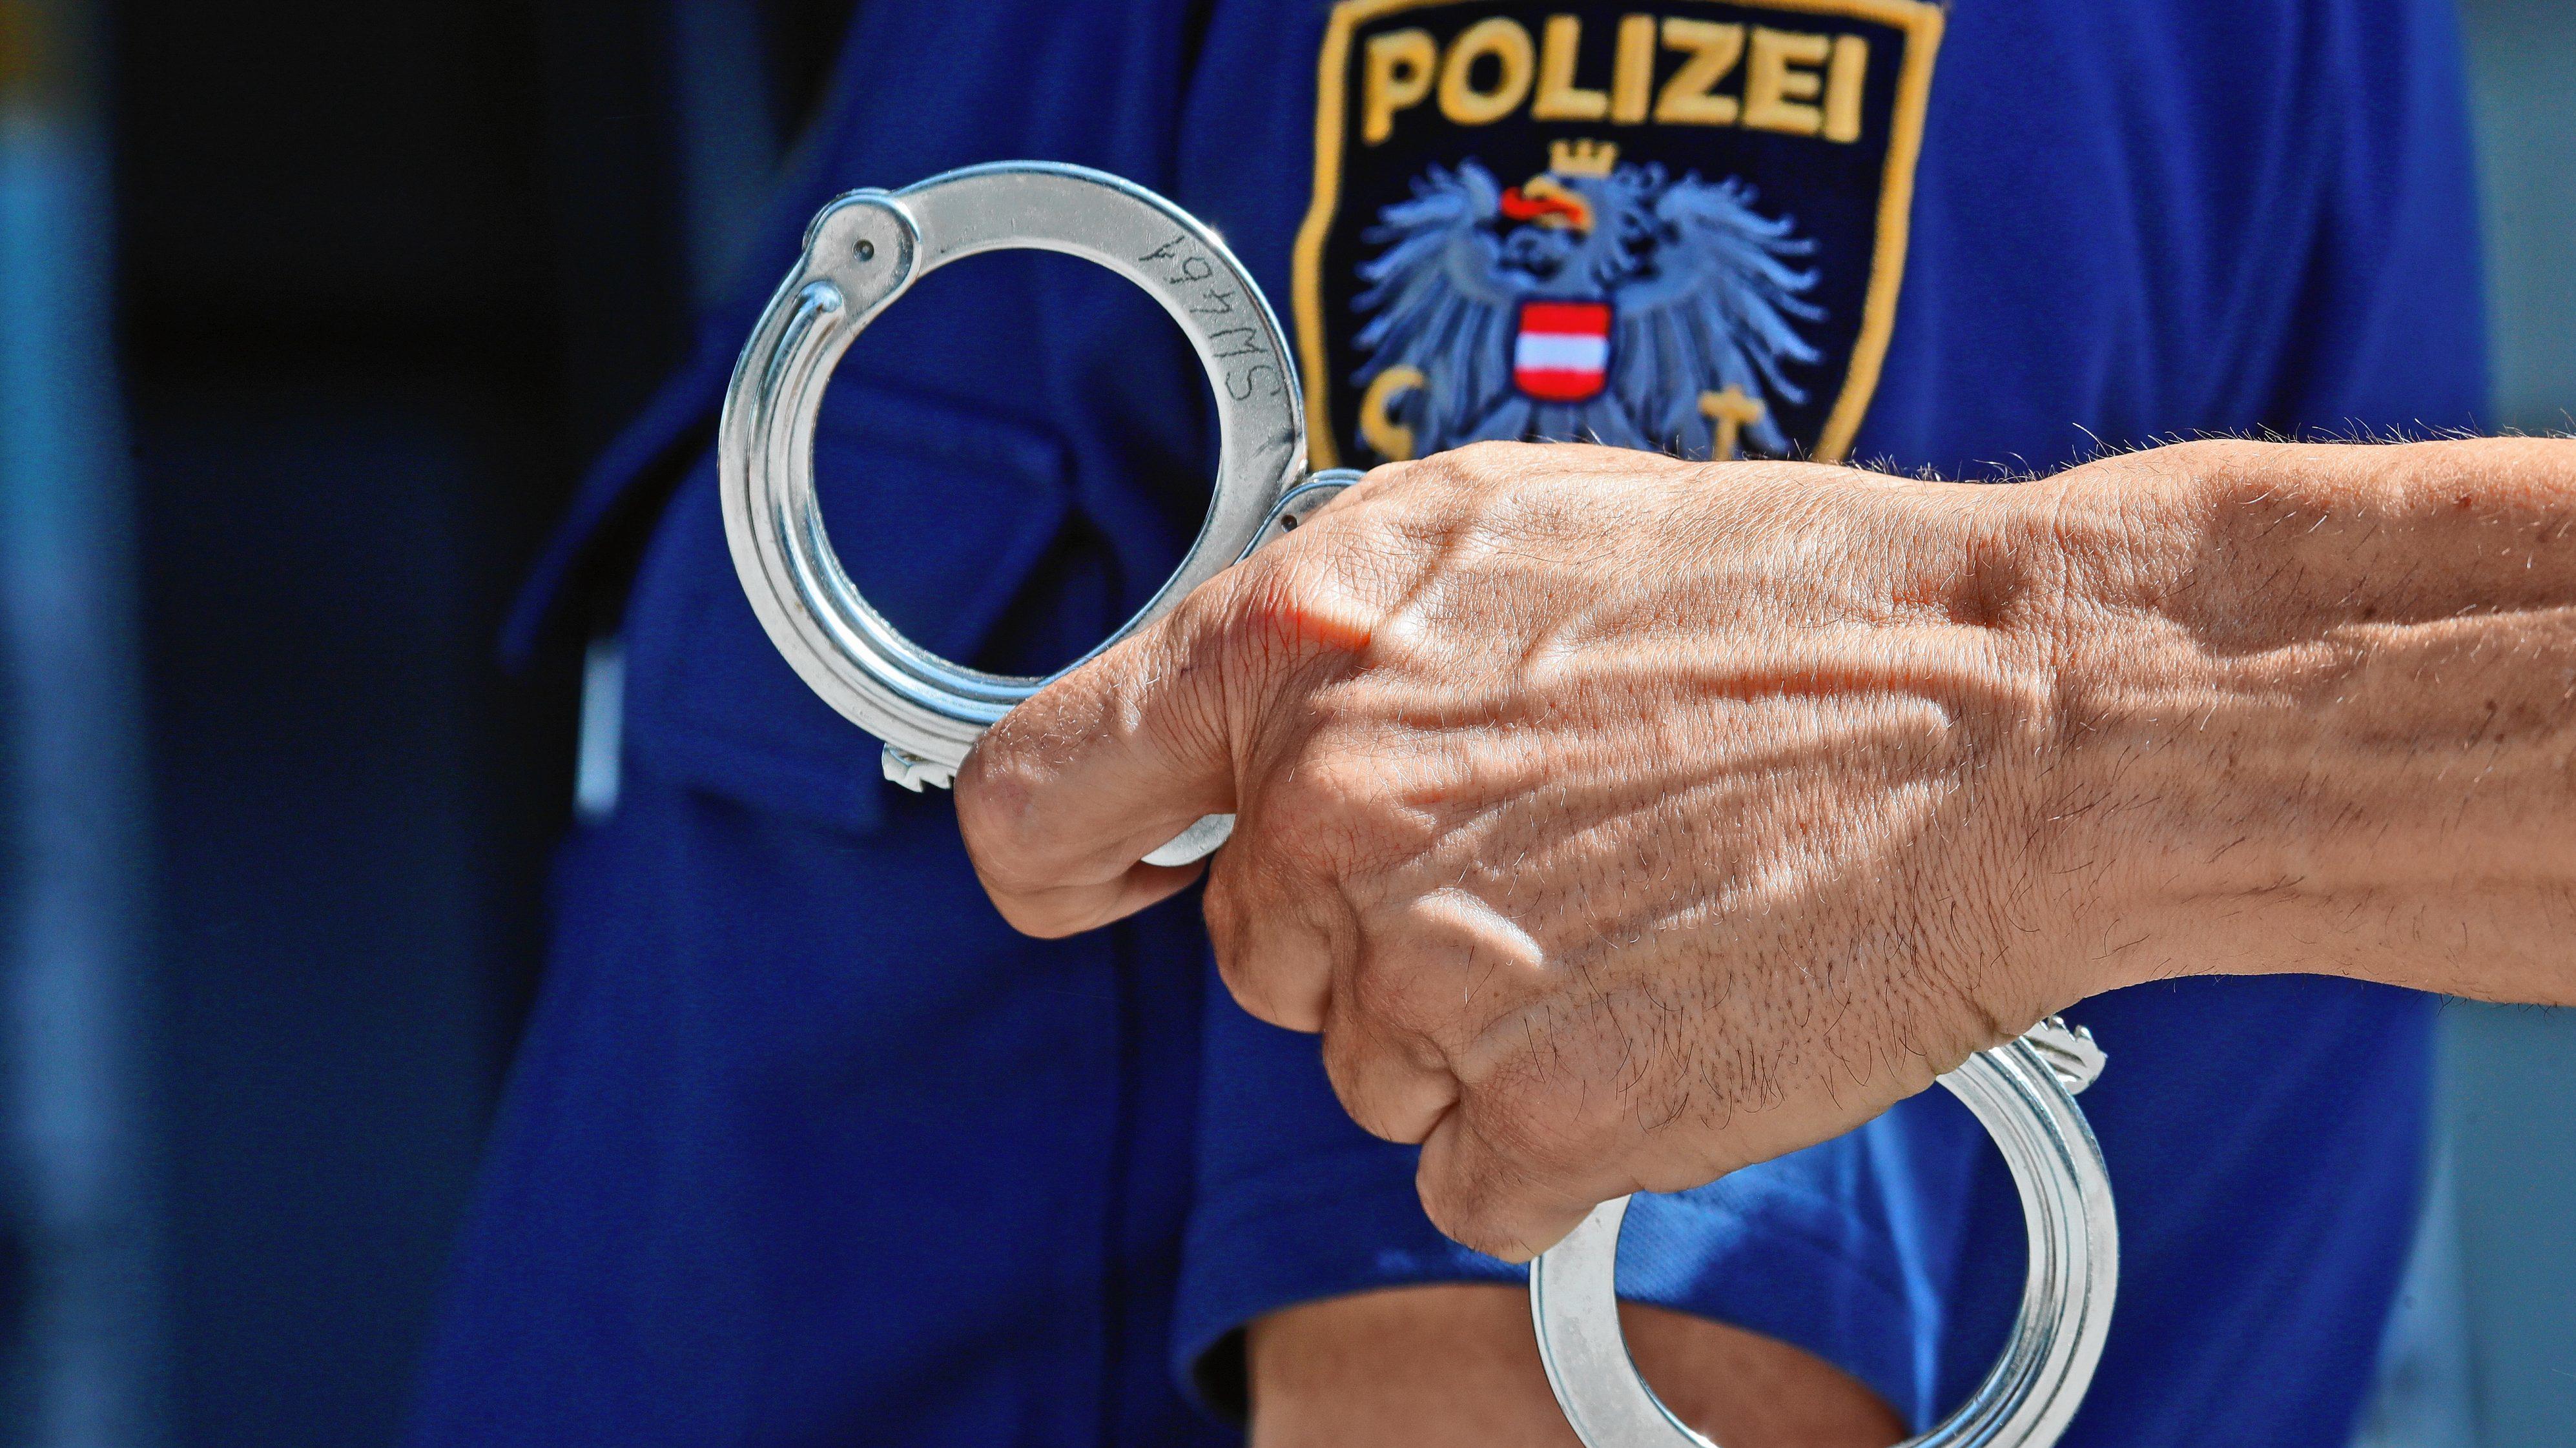 Banküberfall vereitelt: Täter ist Ex-Polizist!